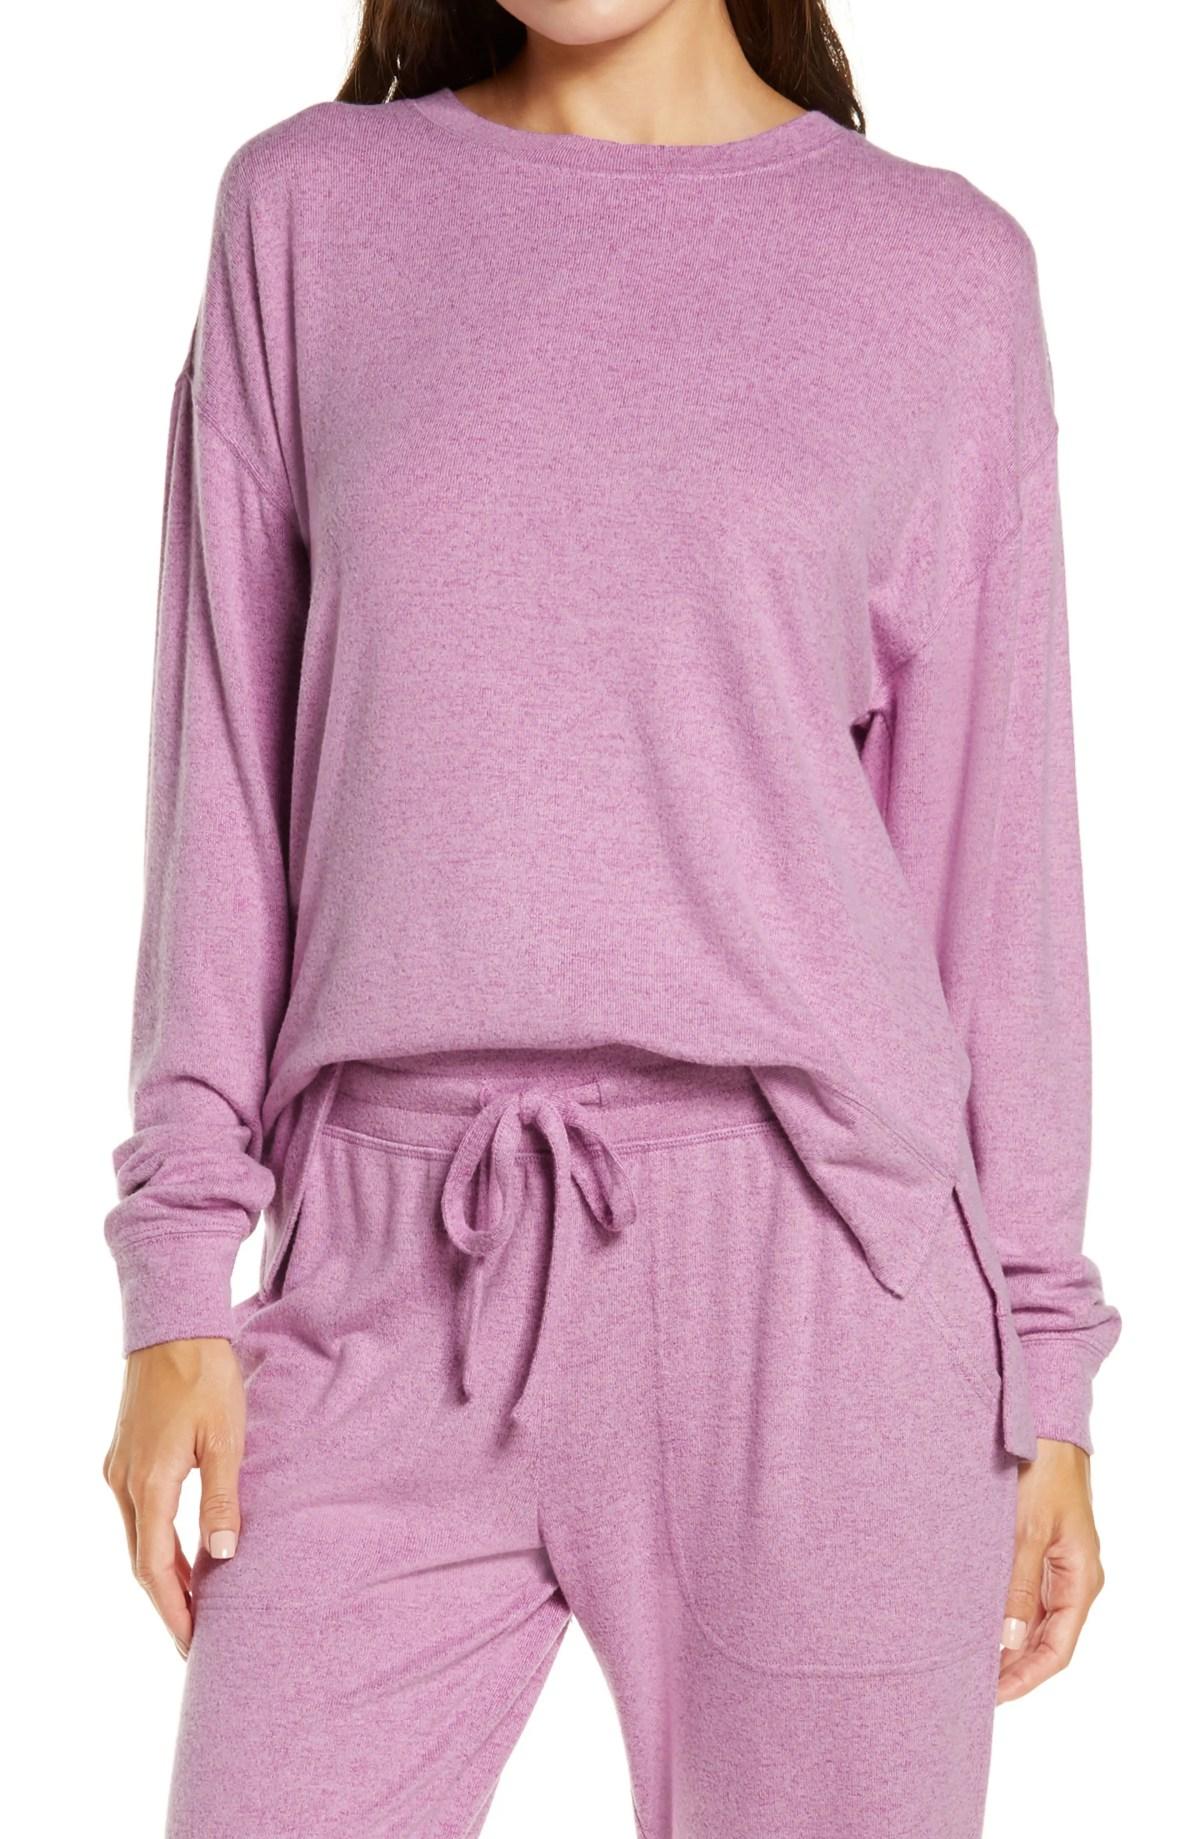 BP. Cozy Top, Main, color, PURPLE GUST/PINK LAVENDAR MARL